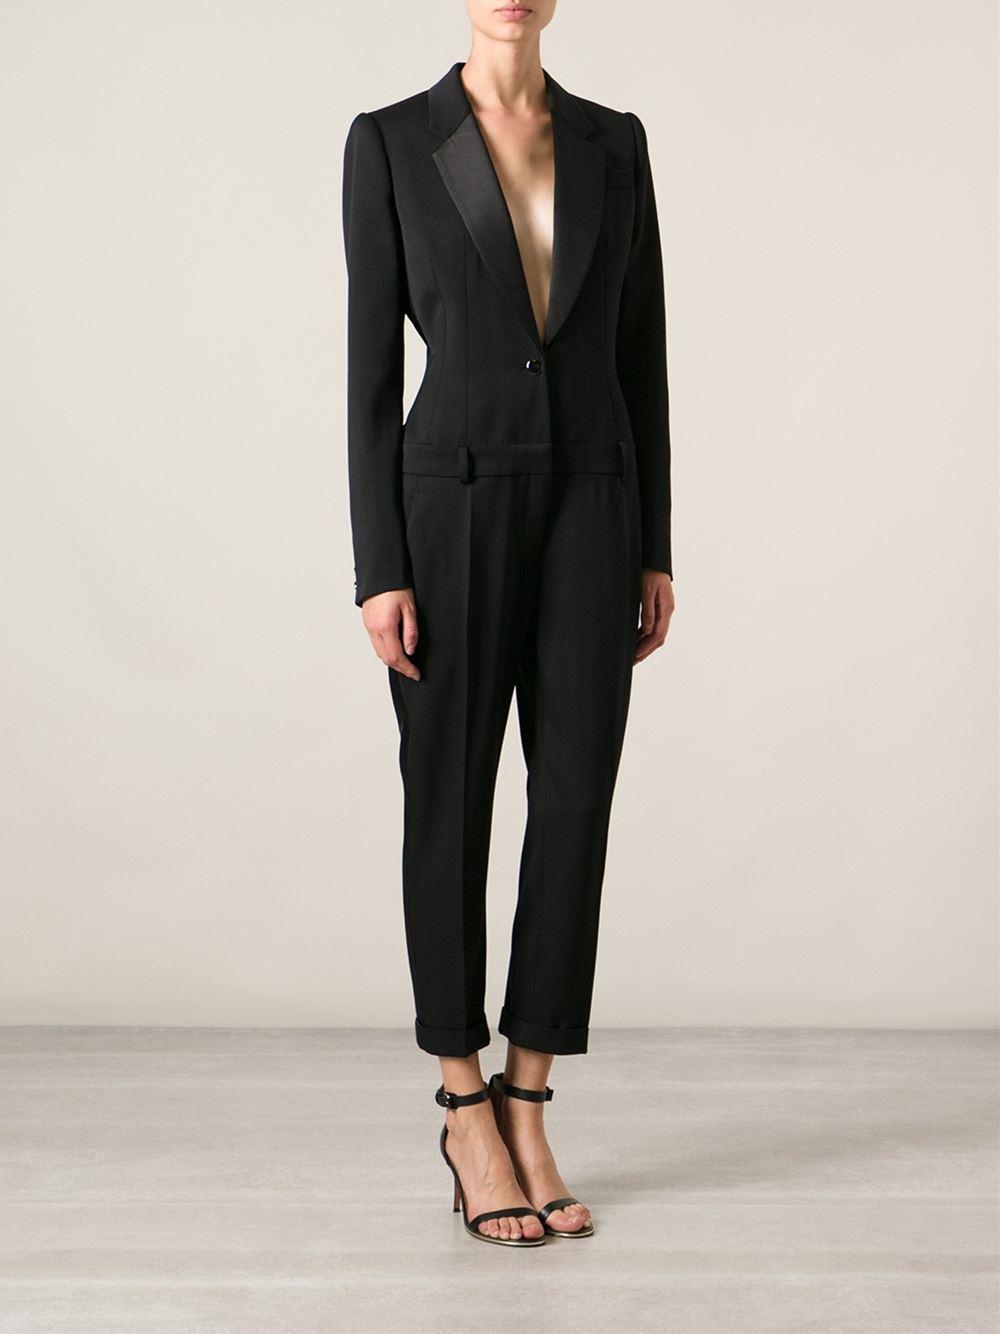 Lyst Alexander Mcqueen Suit Style Jumpsuit In Black